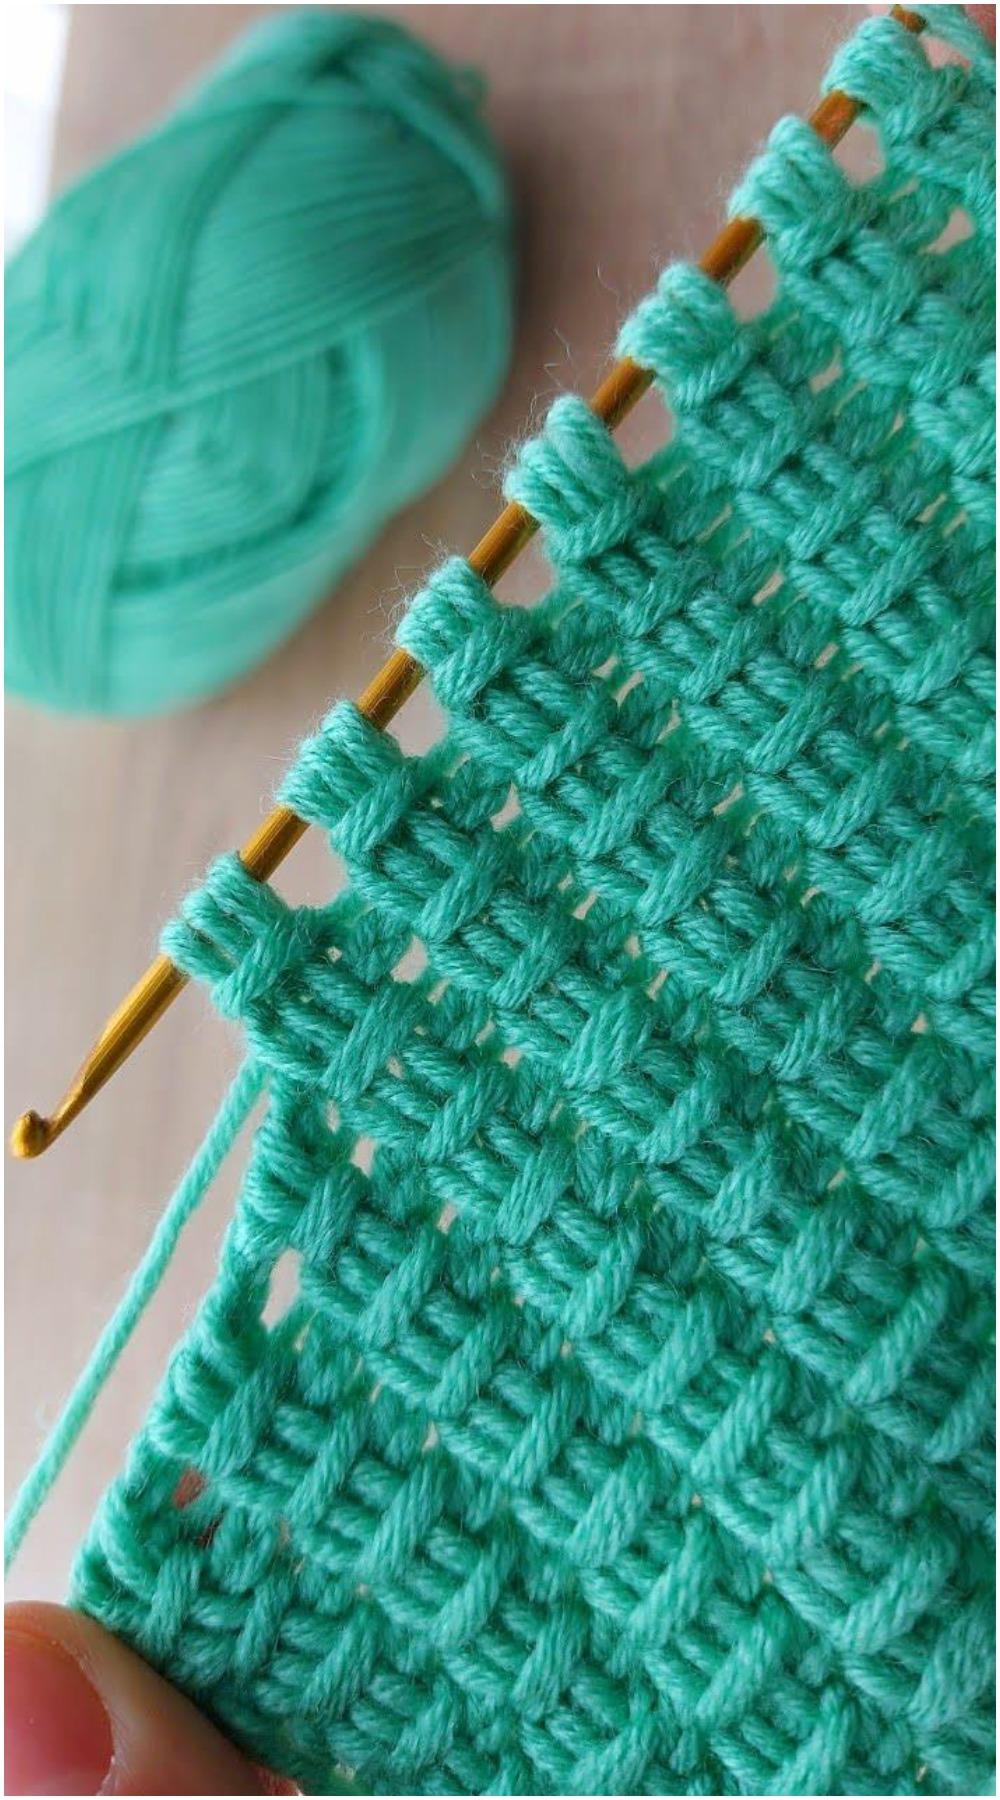 Learn To Crochet Tunisian Stitches